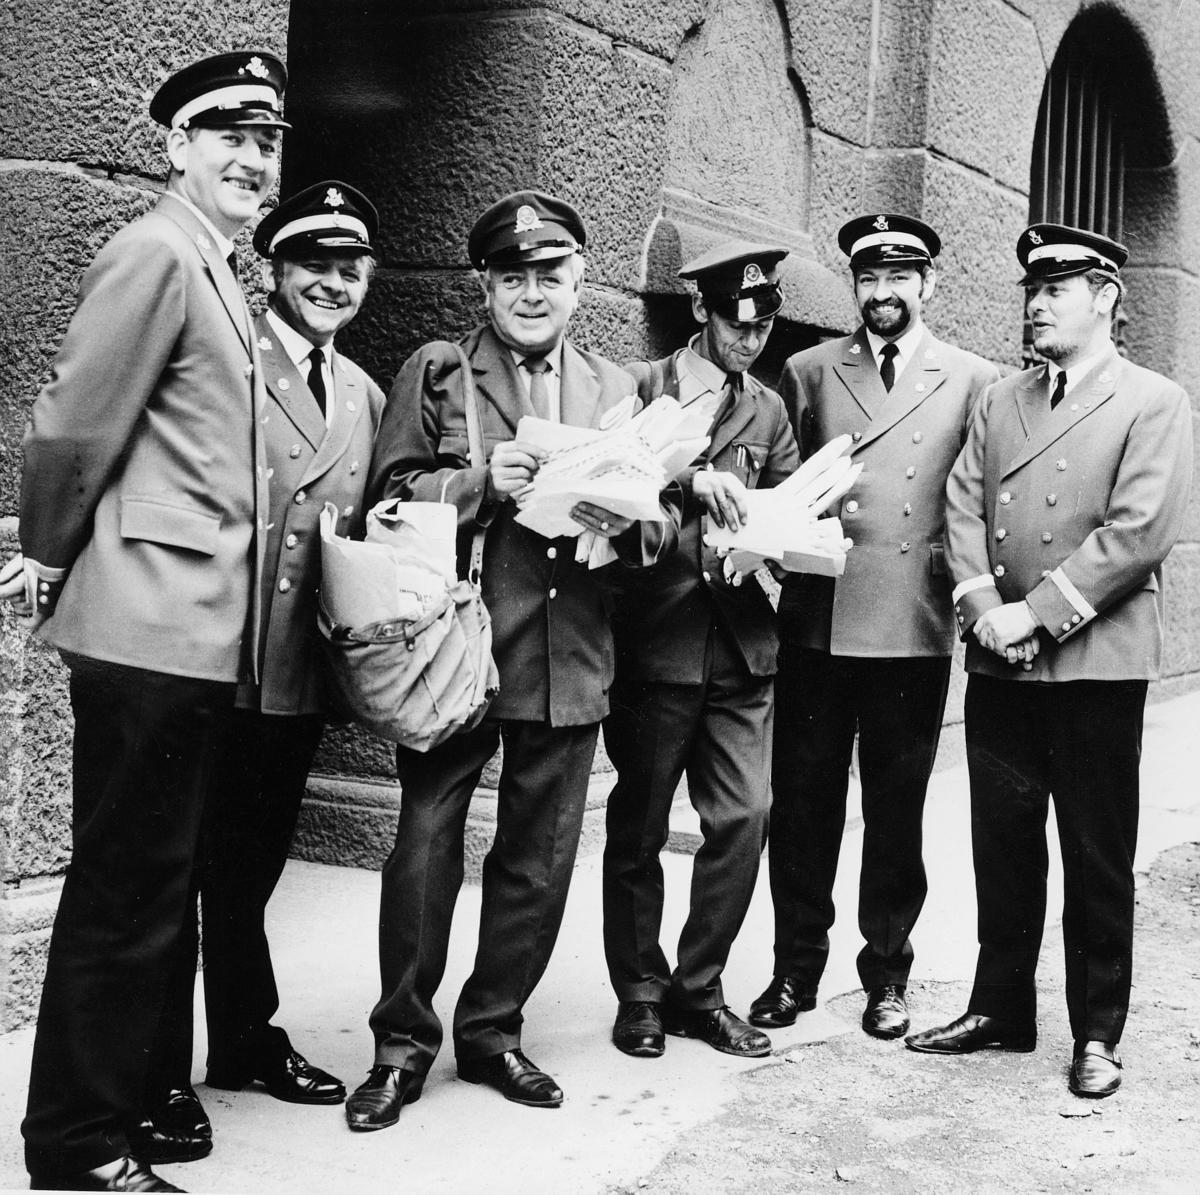 omdeling, Oslo, seks postbud, uniformer